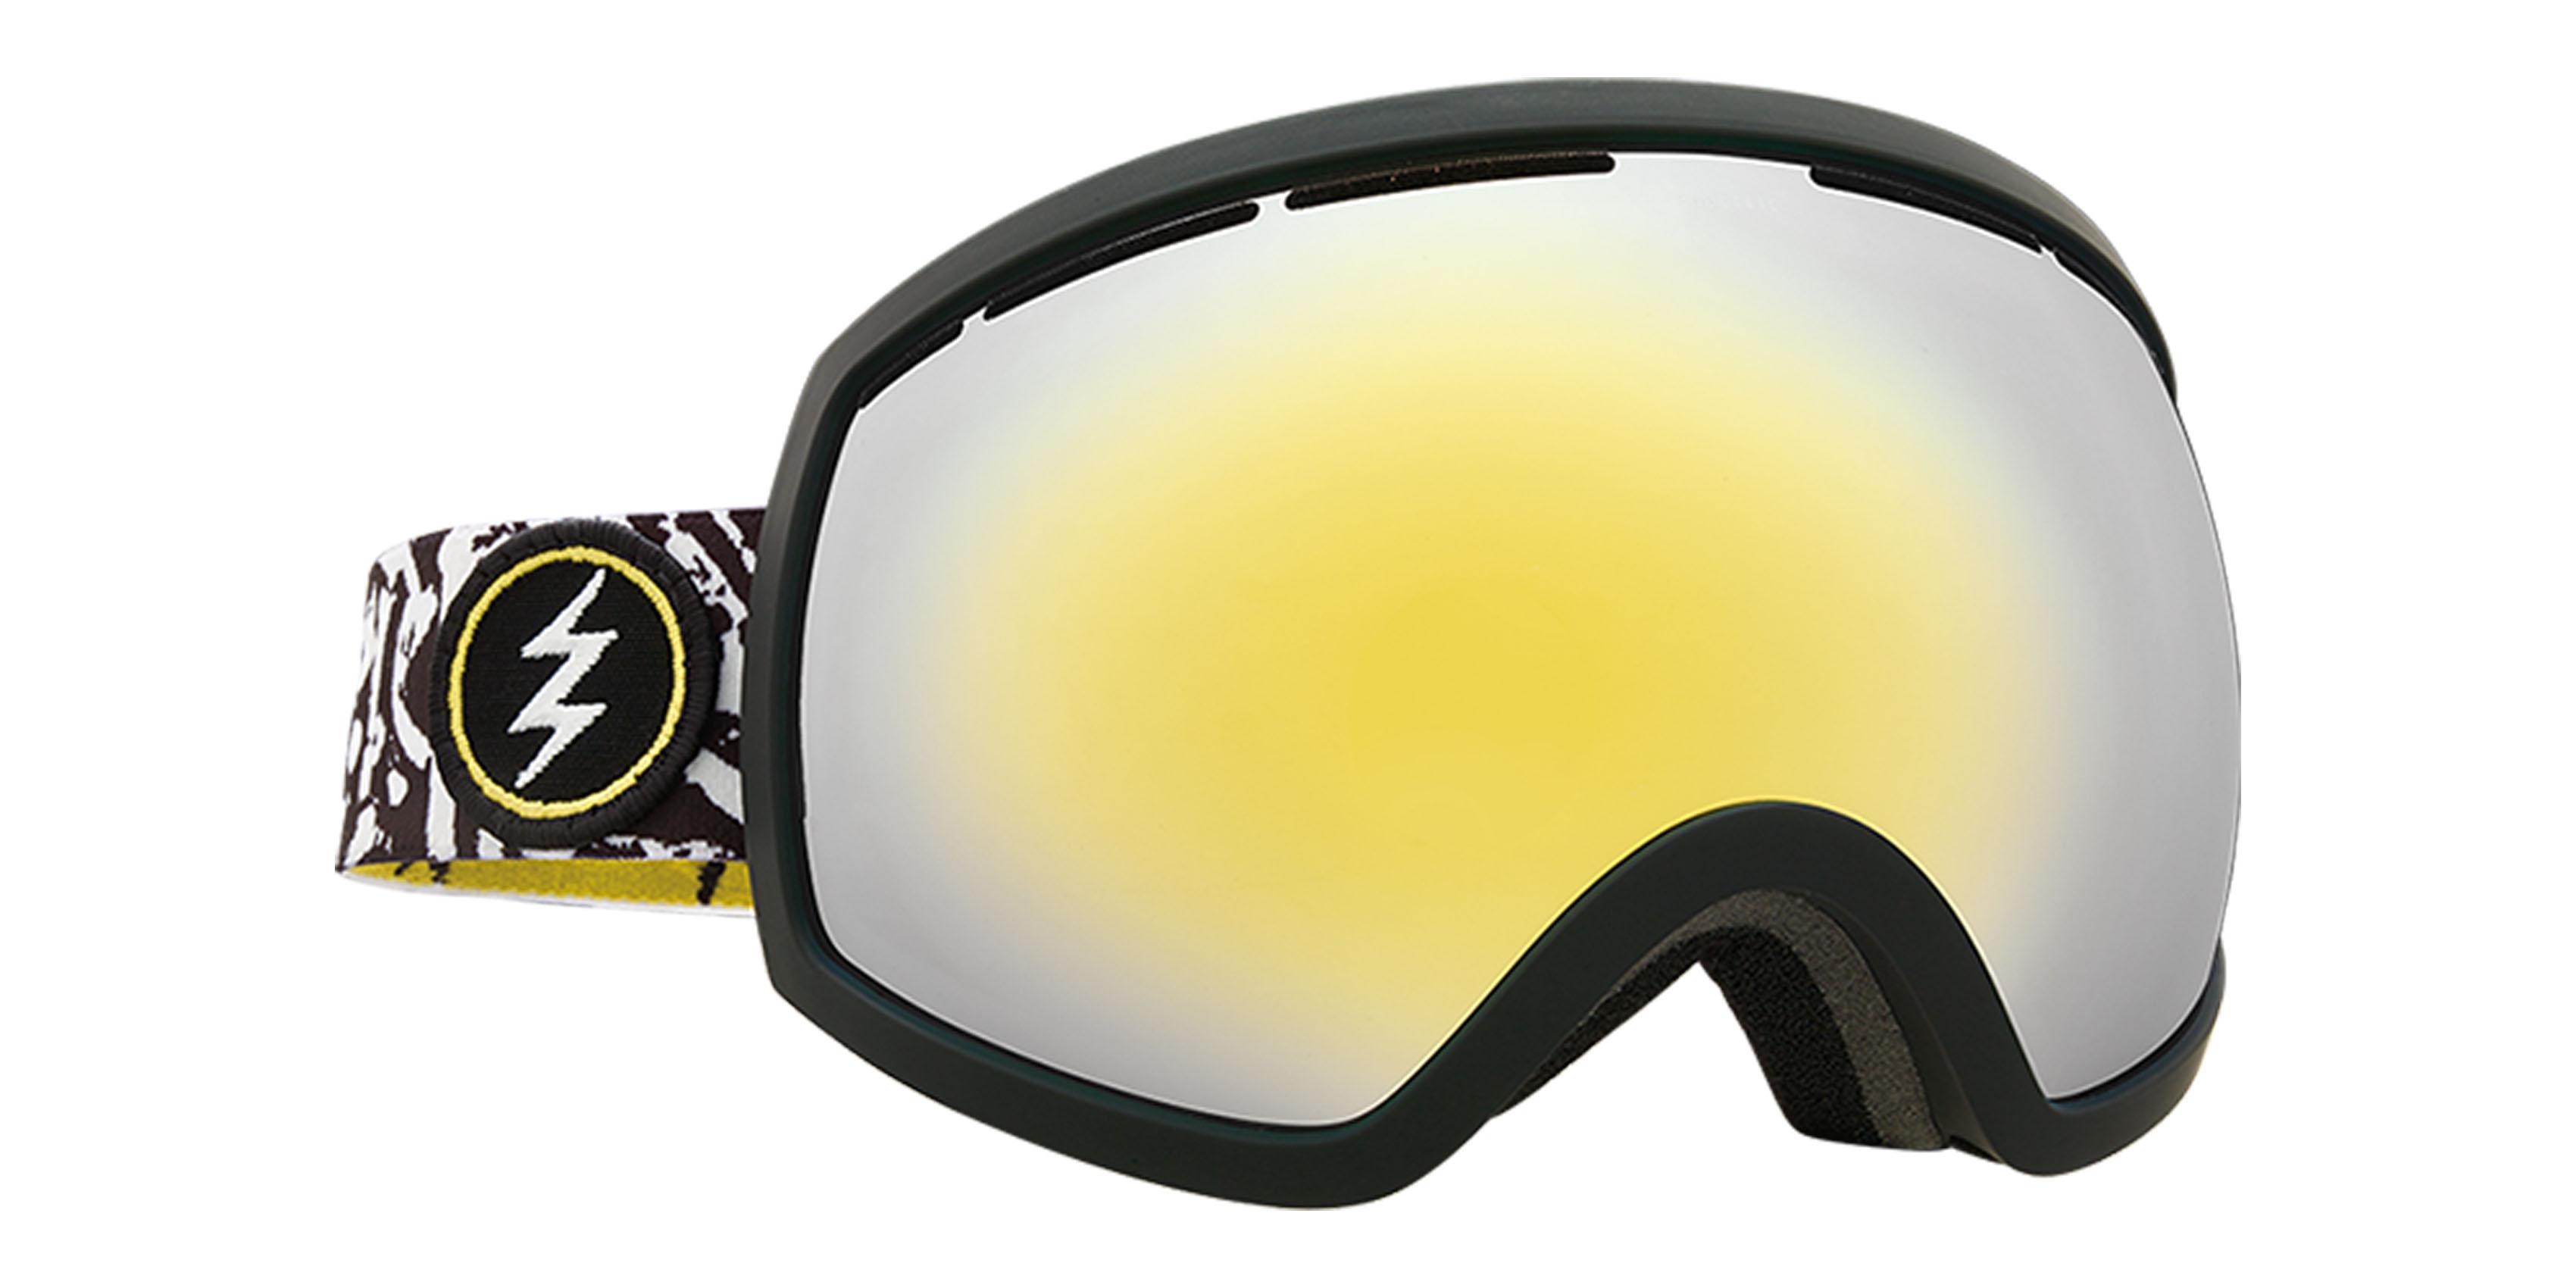 874216abe32 Electric EG2 Snowboard Goggles 2018 - Bones w Brose Gold Chrome + Bonus  Choice Lens. 34%